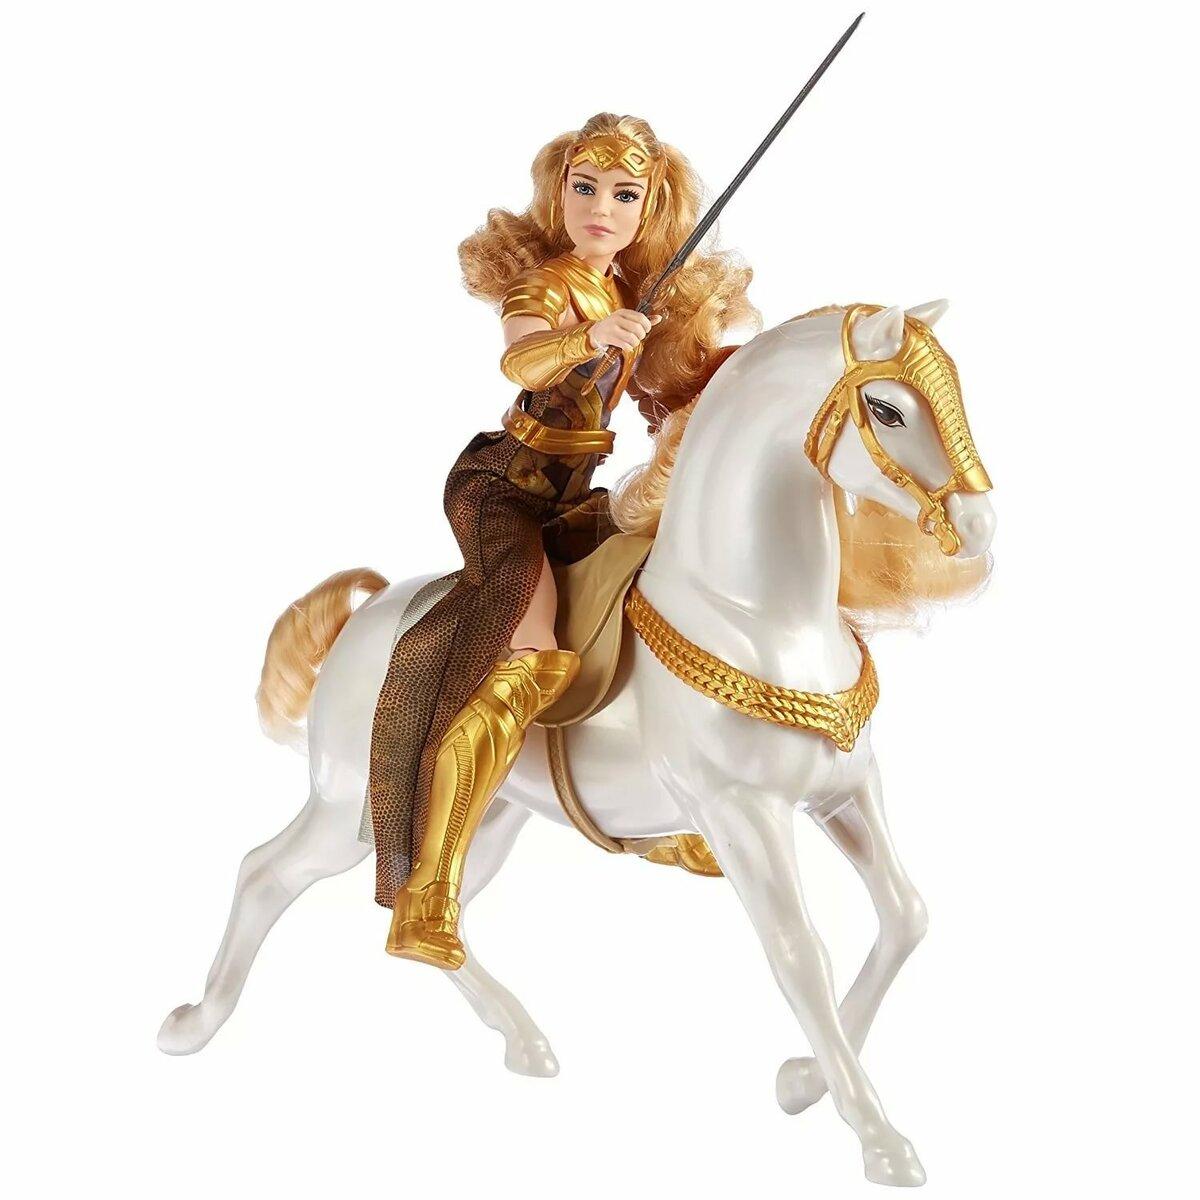 упомянул, картинки игрушки барби лошади каждый